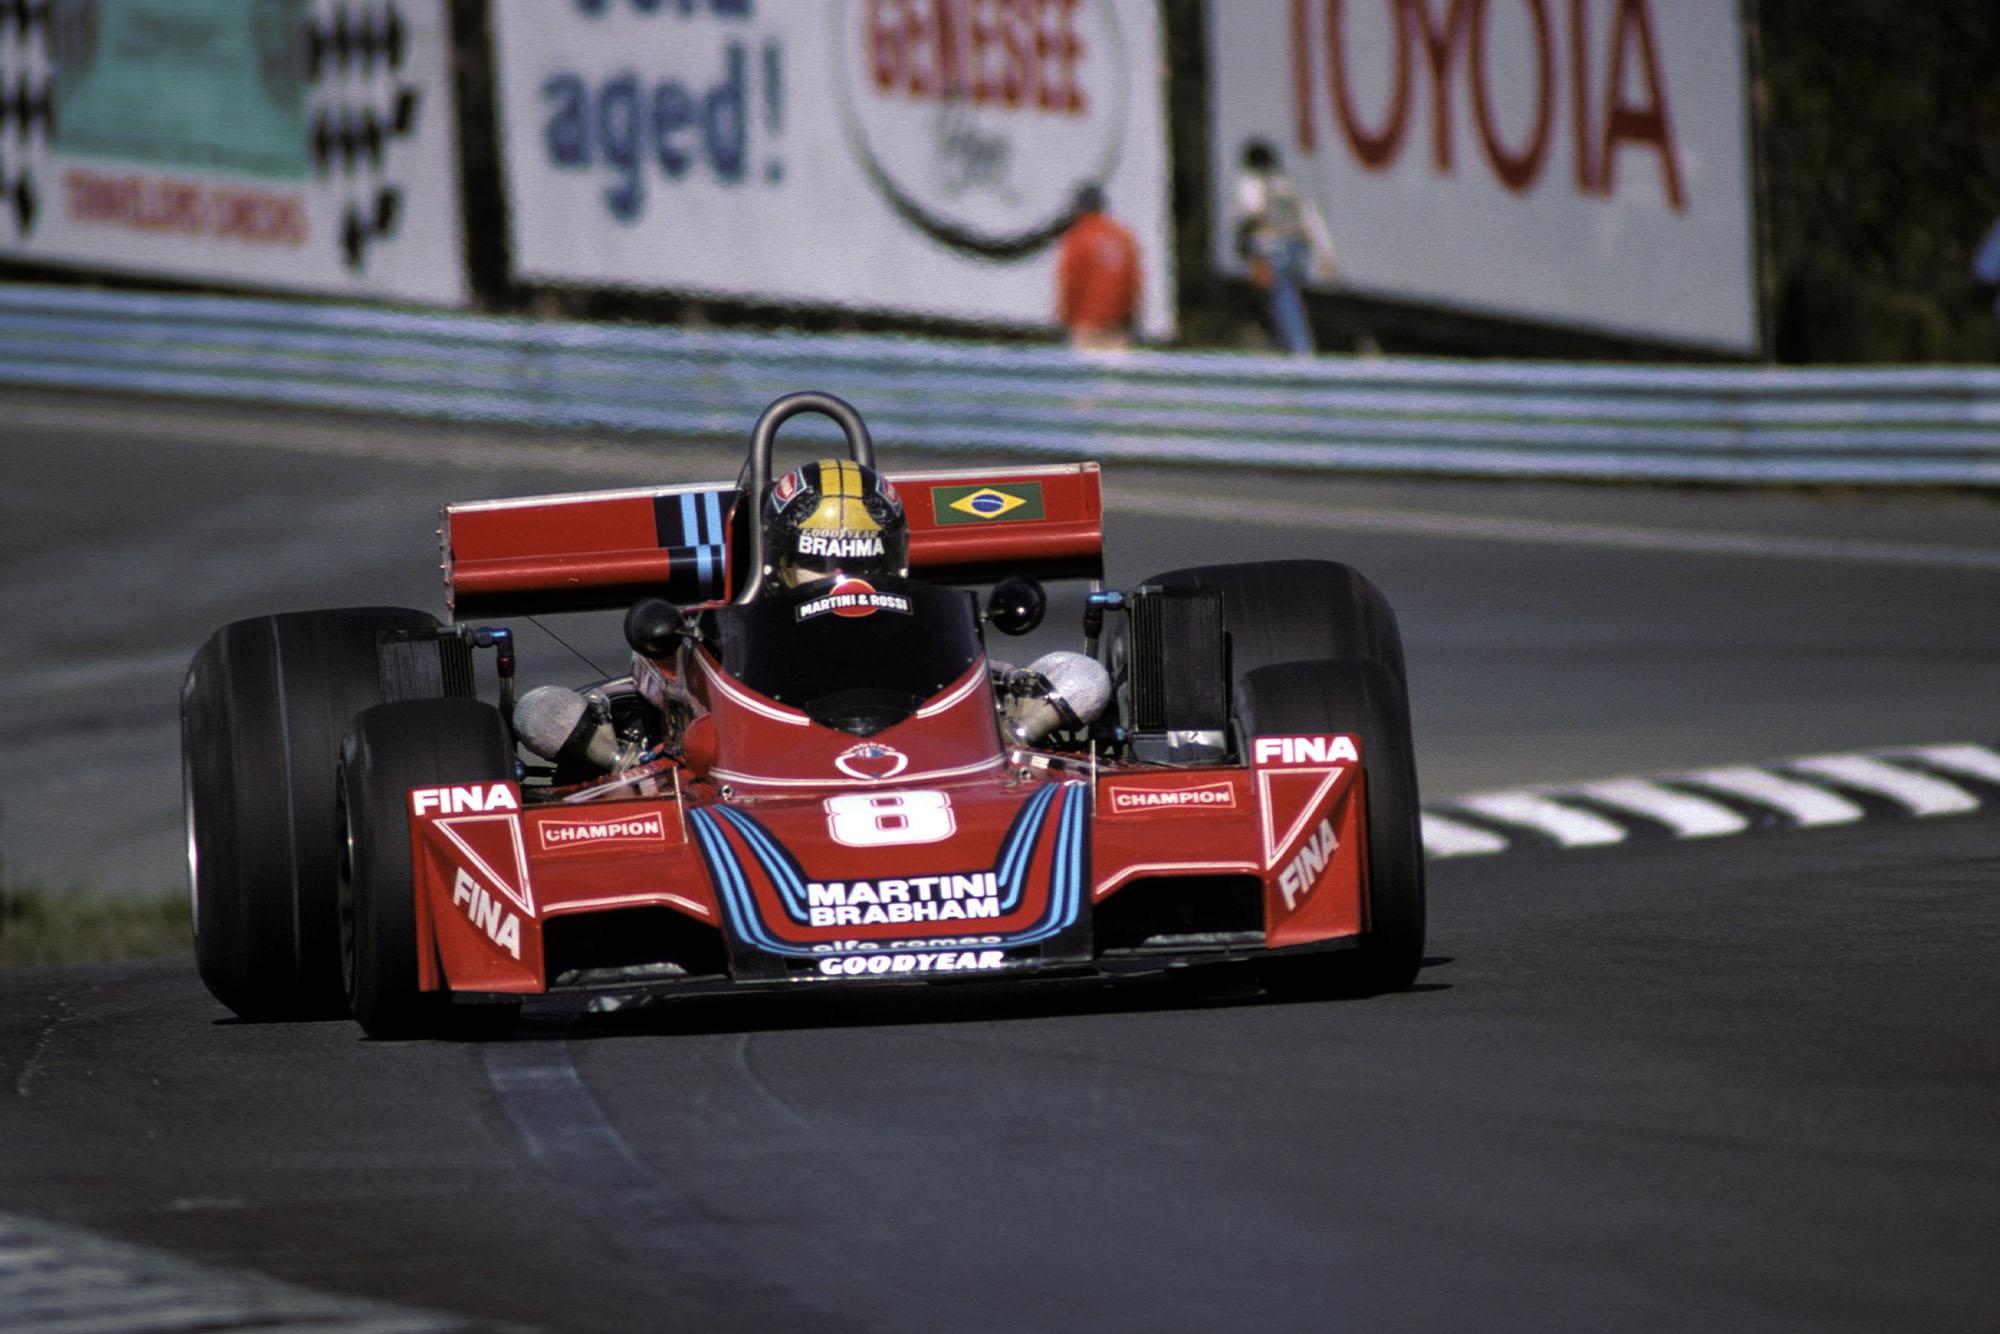 Carlos Pace (Brabham) at the 1976 United States Grand Prix East, Watkins Glen.